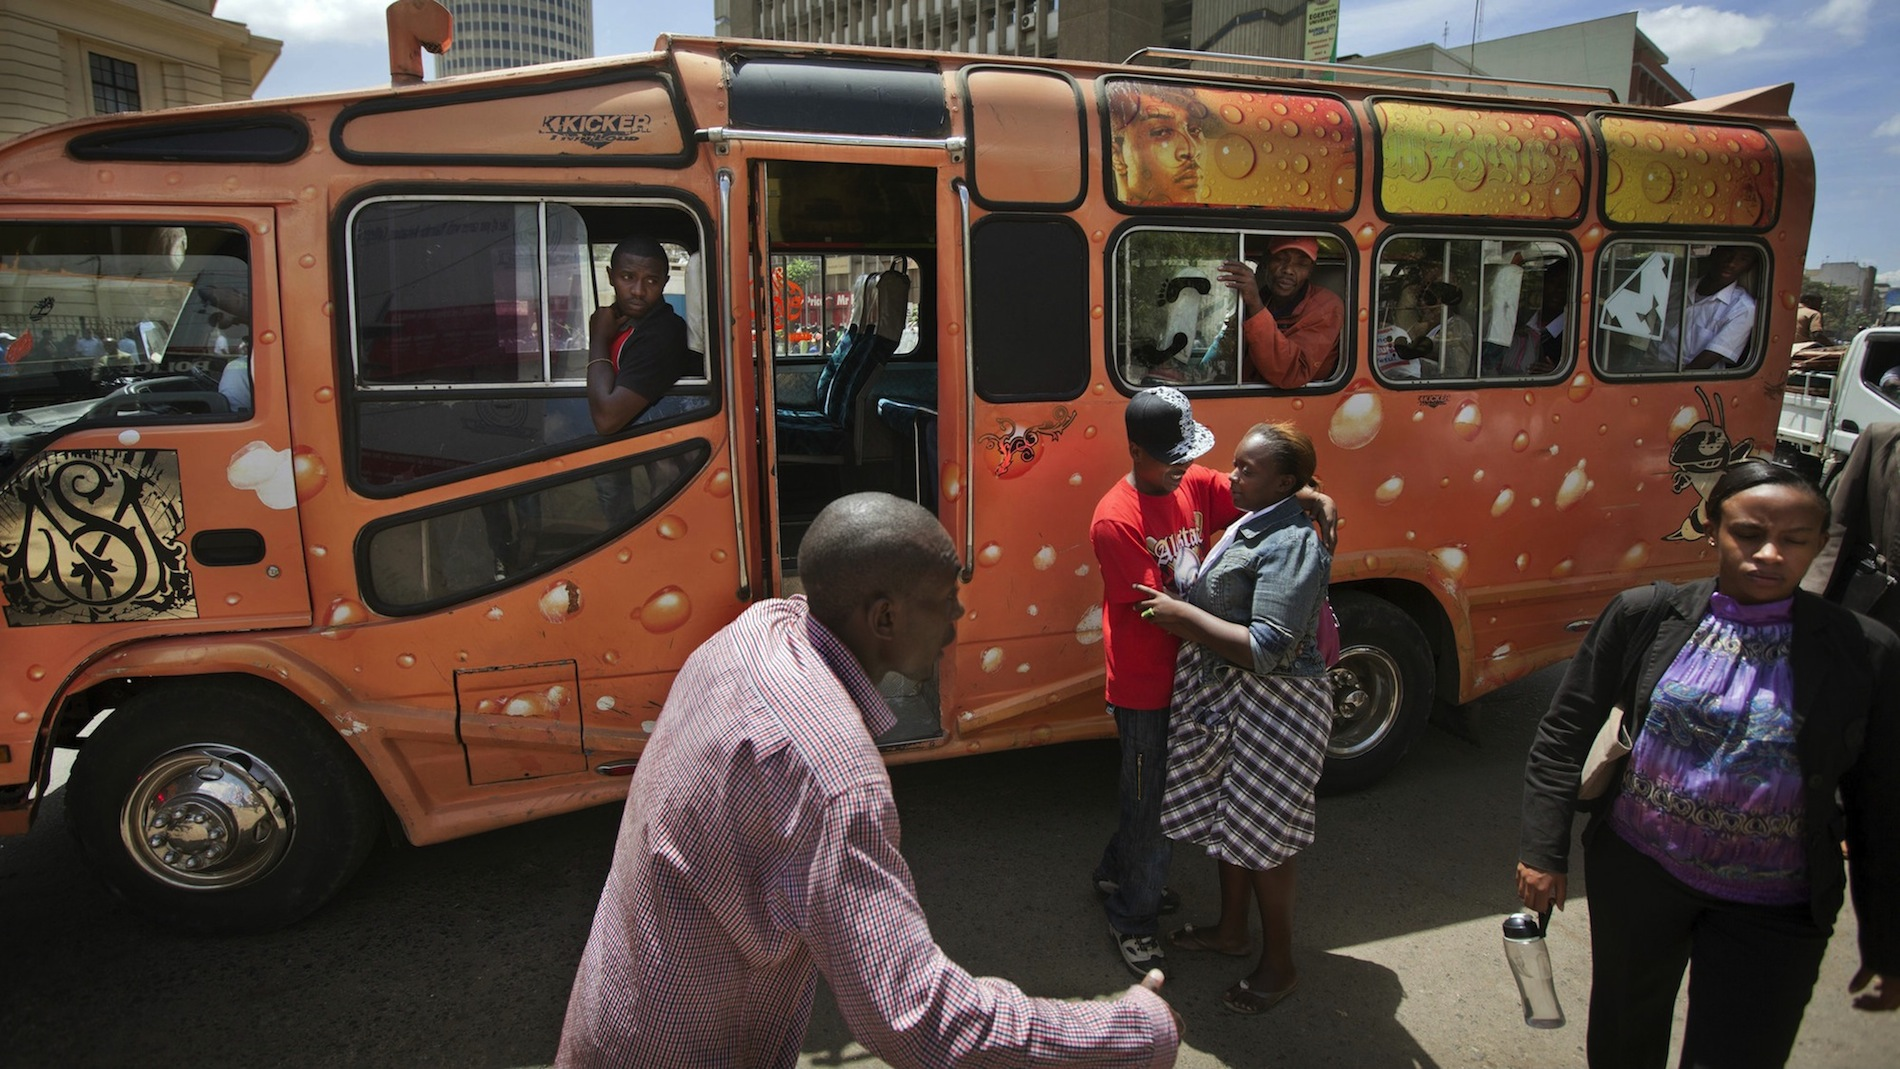 Matatu operators try to coax passengers on board their bus in Nairobi.